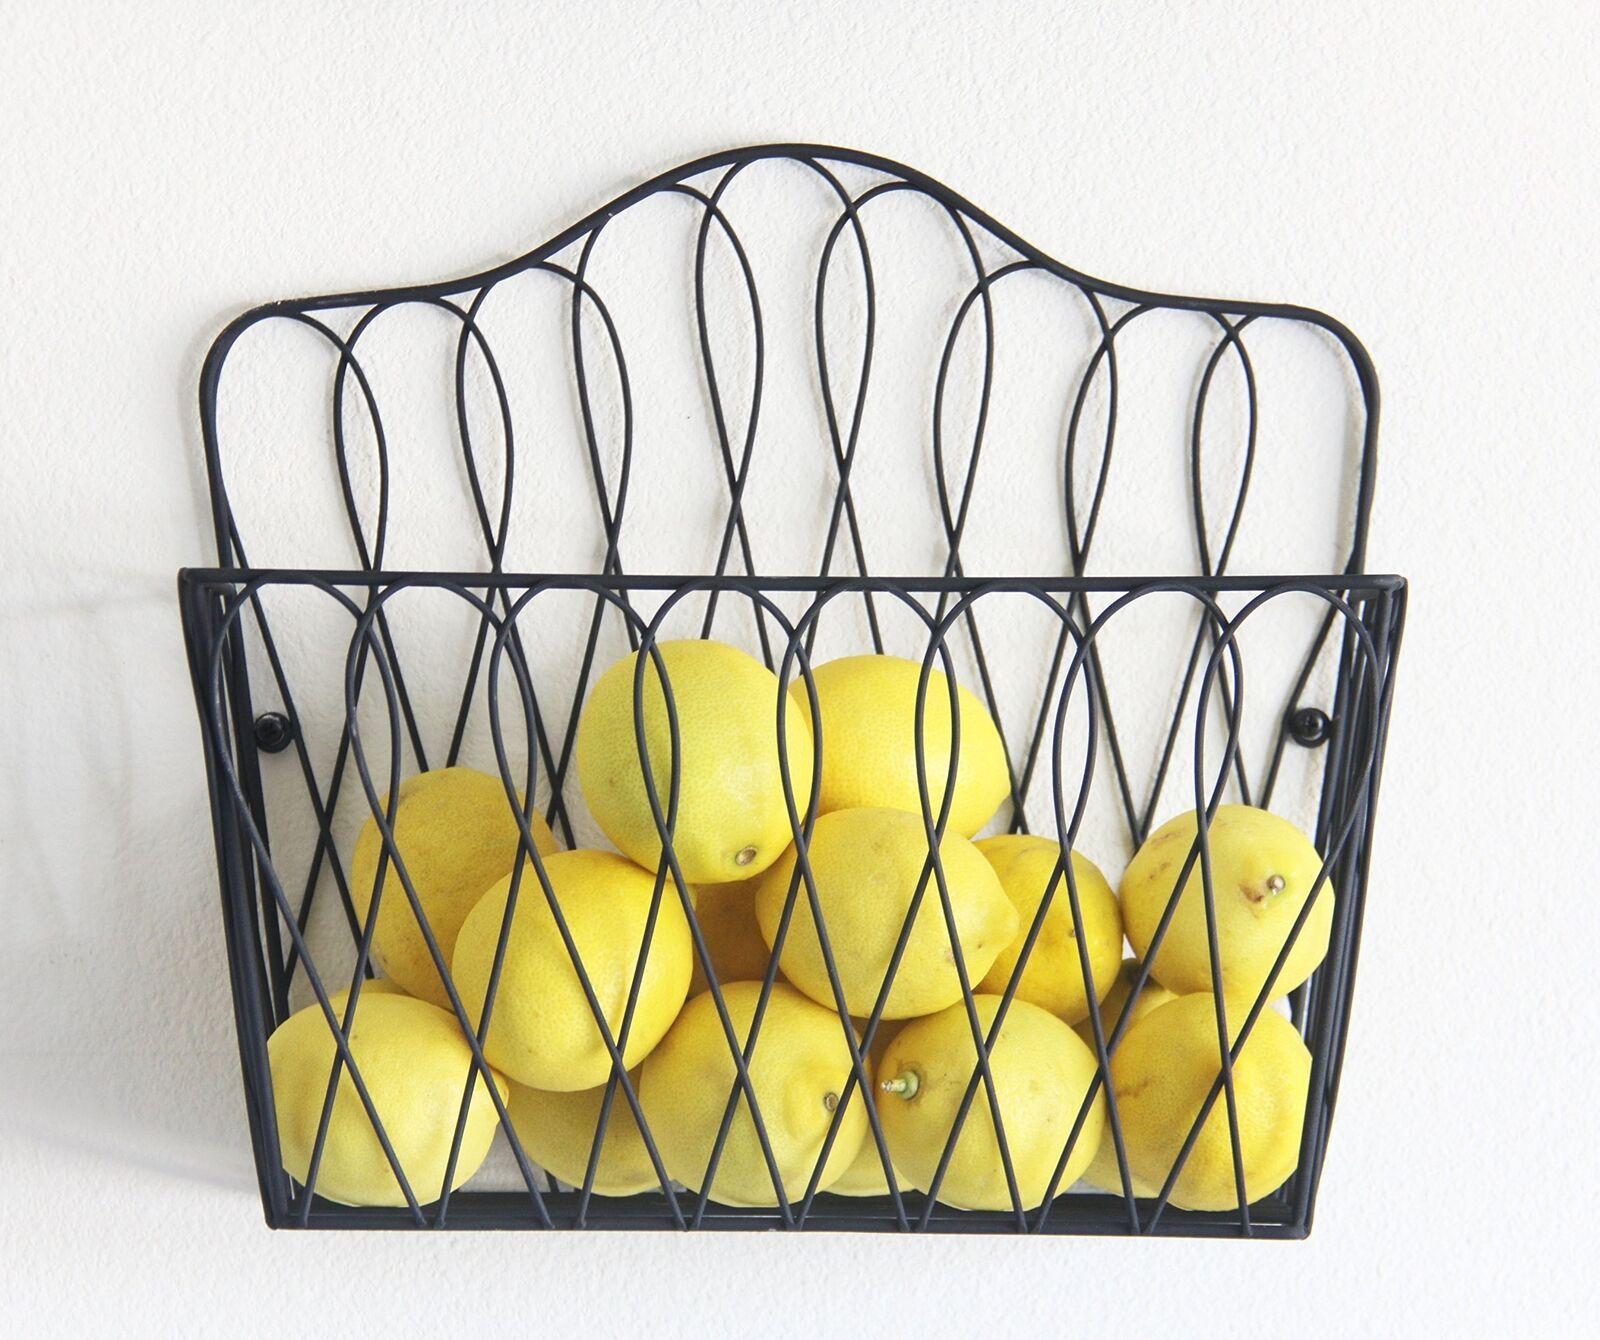 Wall Mount Storage Magazine Rack Holder Fruit Basket Home Kitchen ...